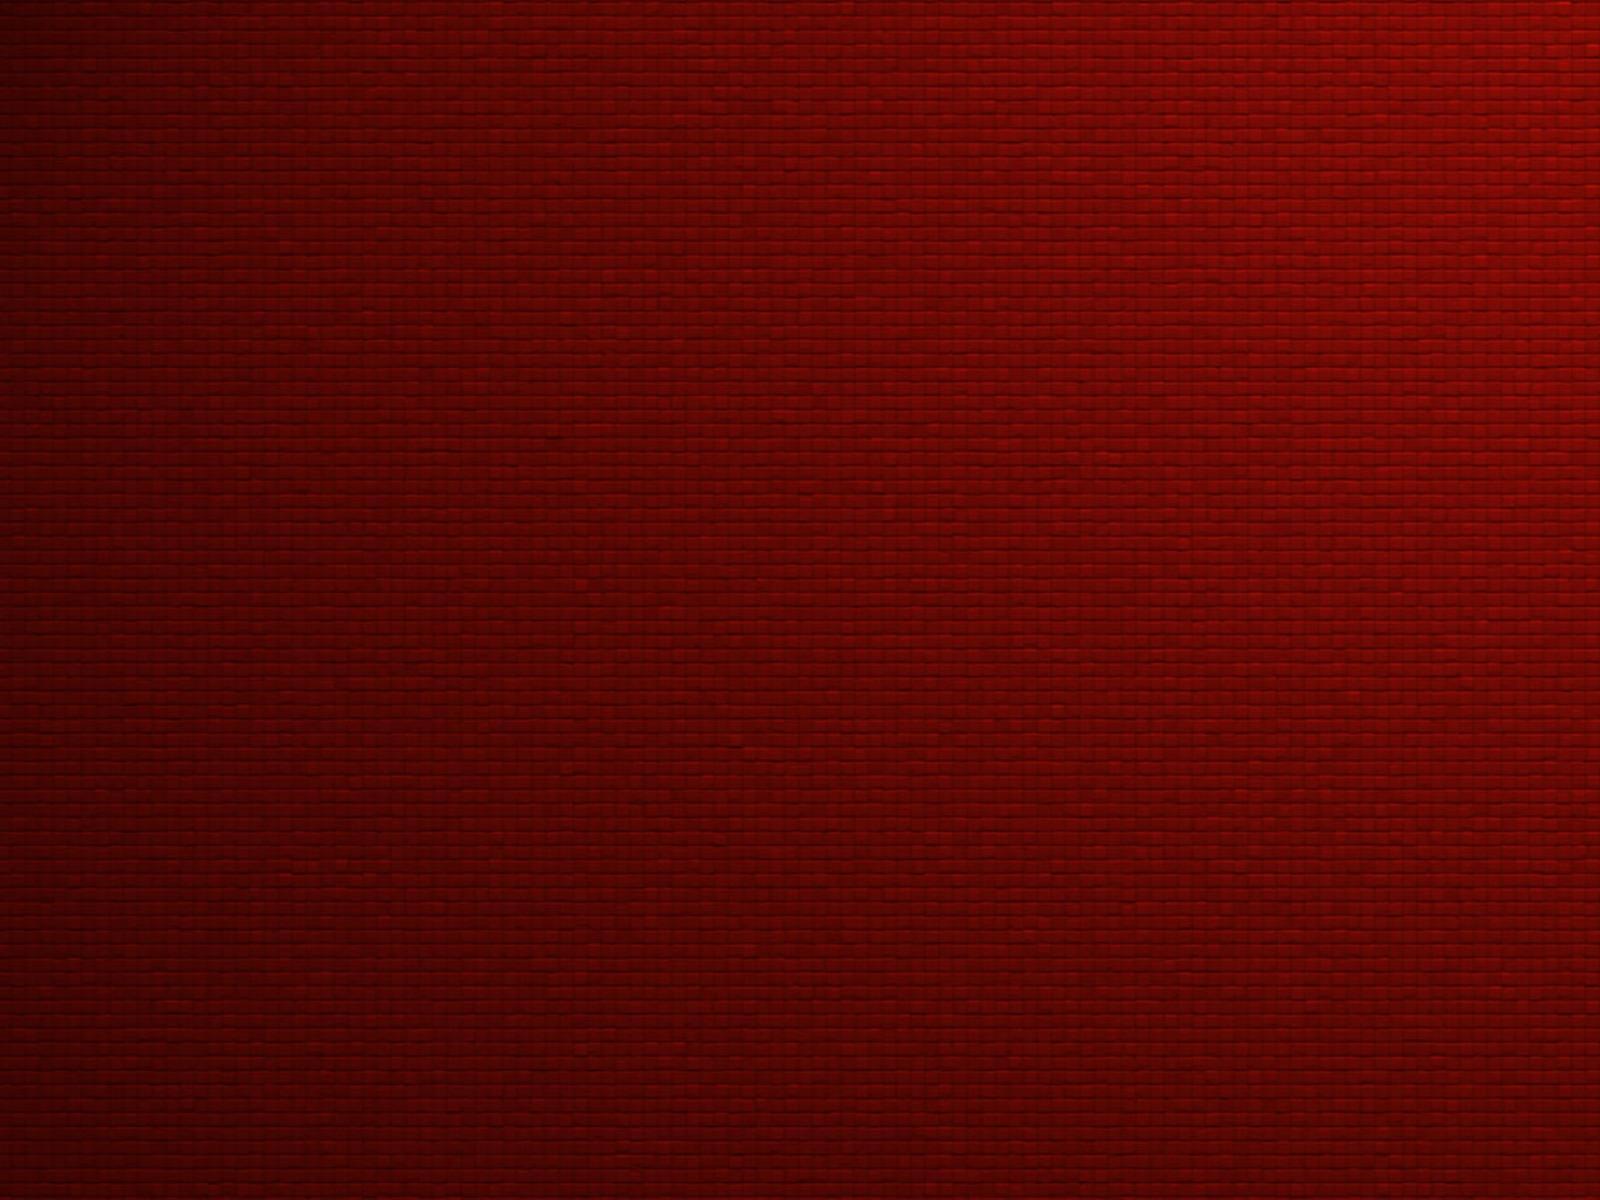 77 Red Desktop Background On Wallpapersafari